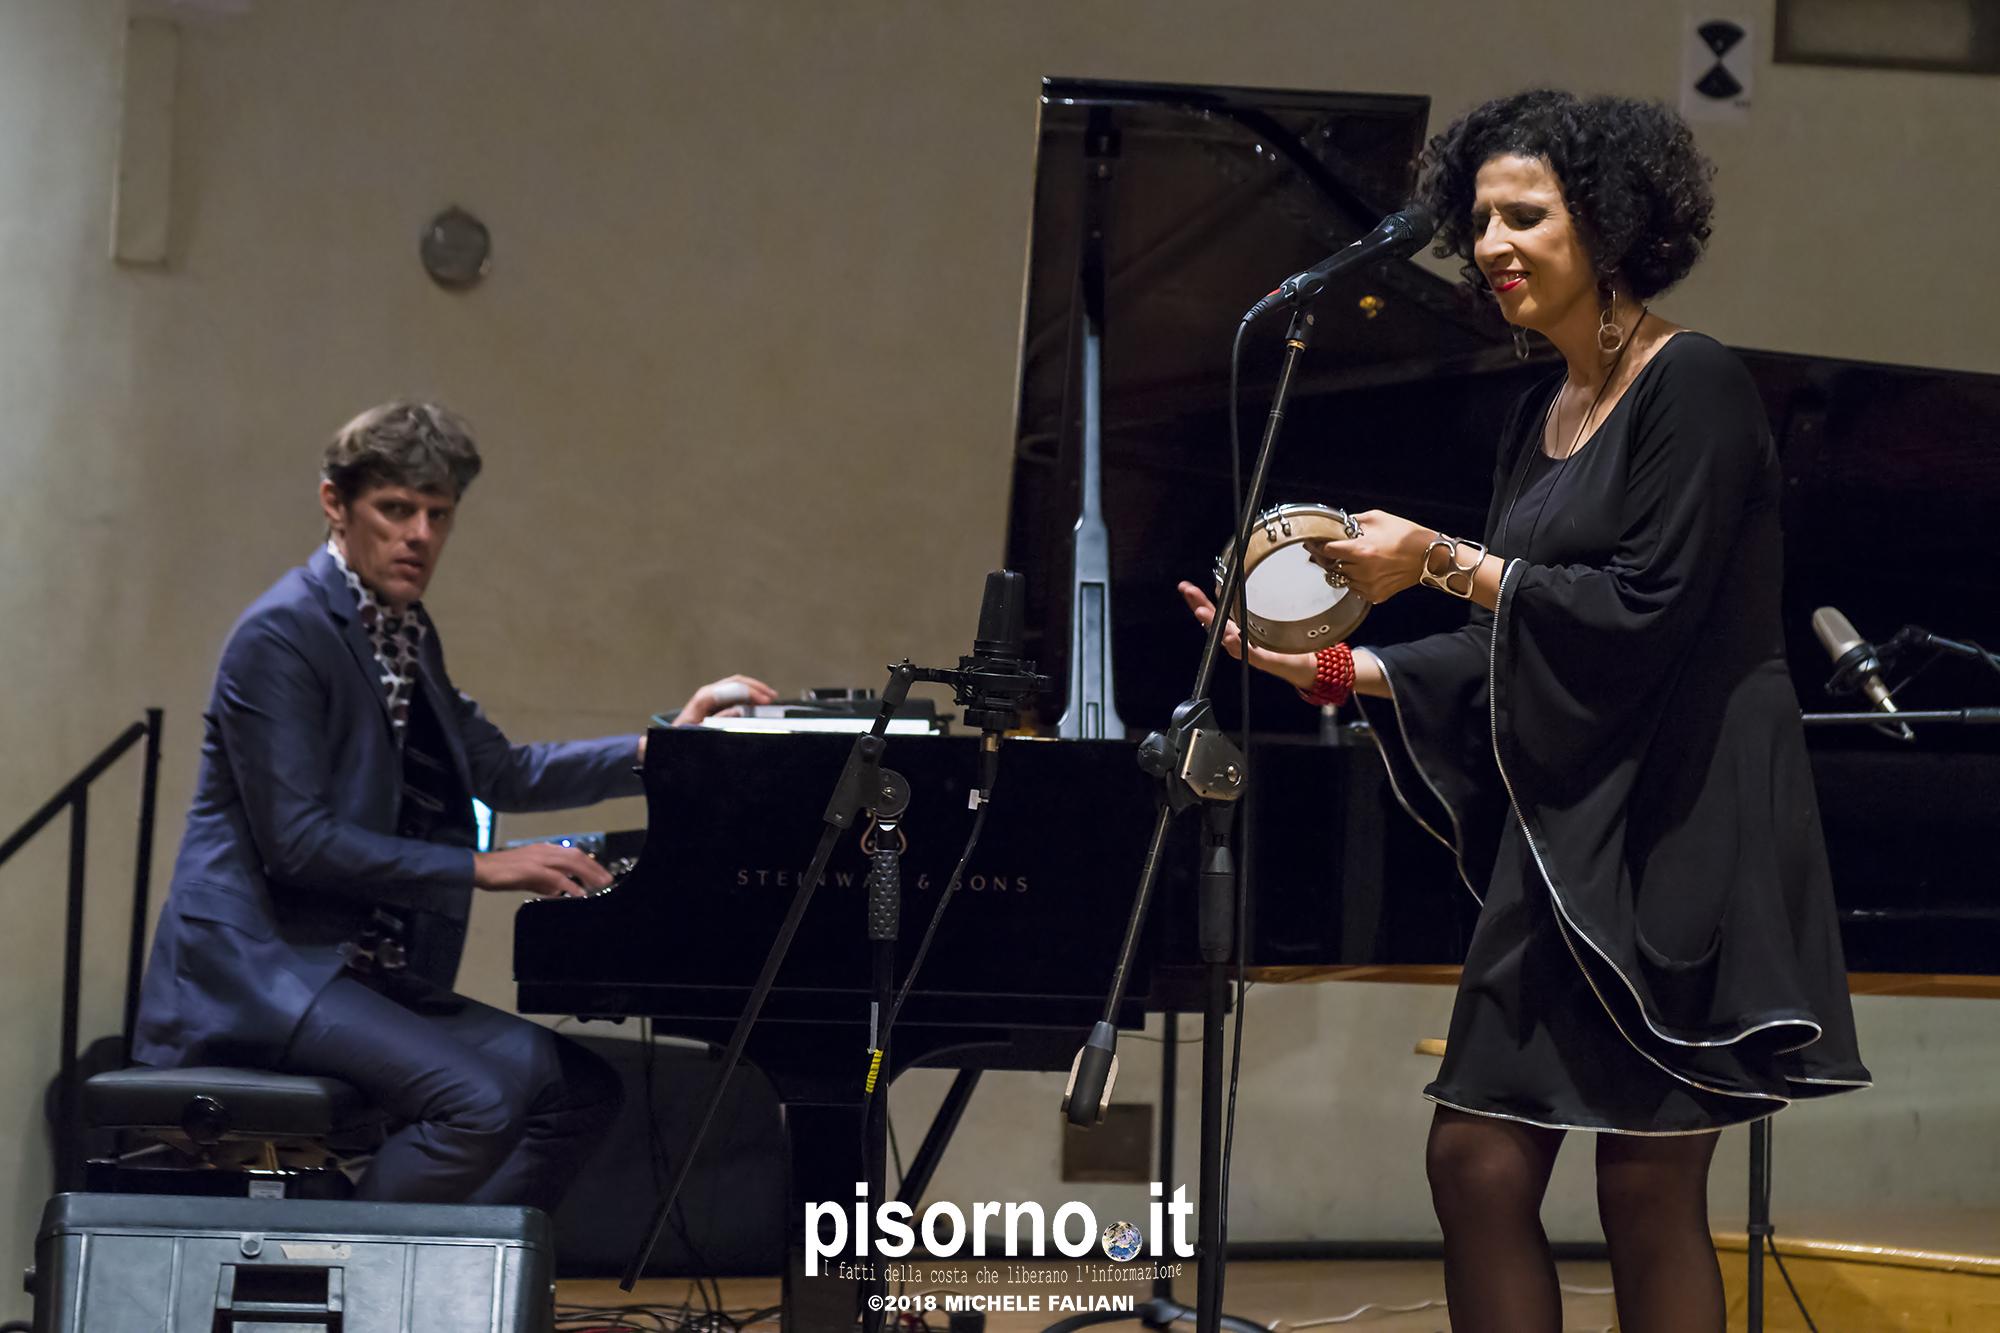 Paula Morelenbaum's Bossarenova Trio @ Conservatorio L. Cherubini (Firenze, Italy), Aprile 12th 2018)